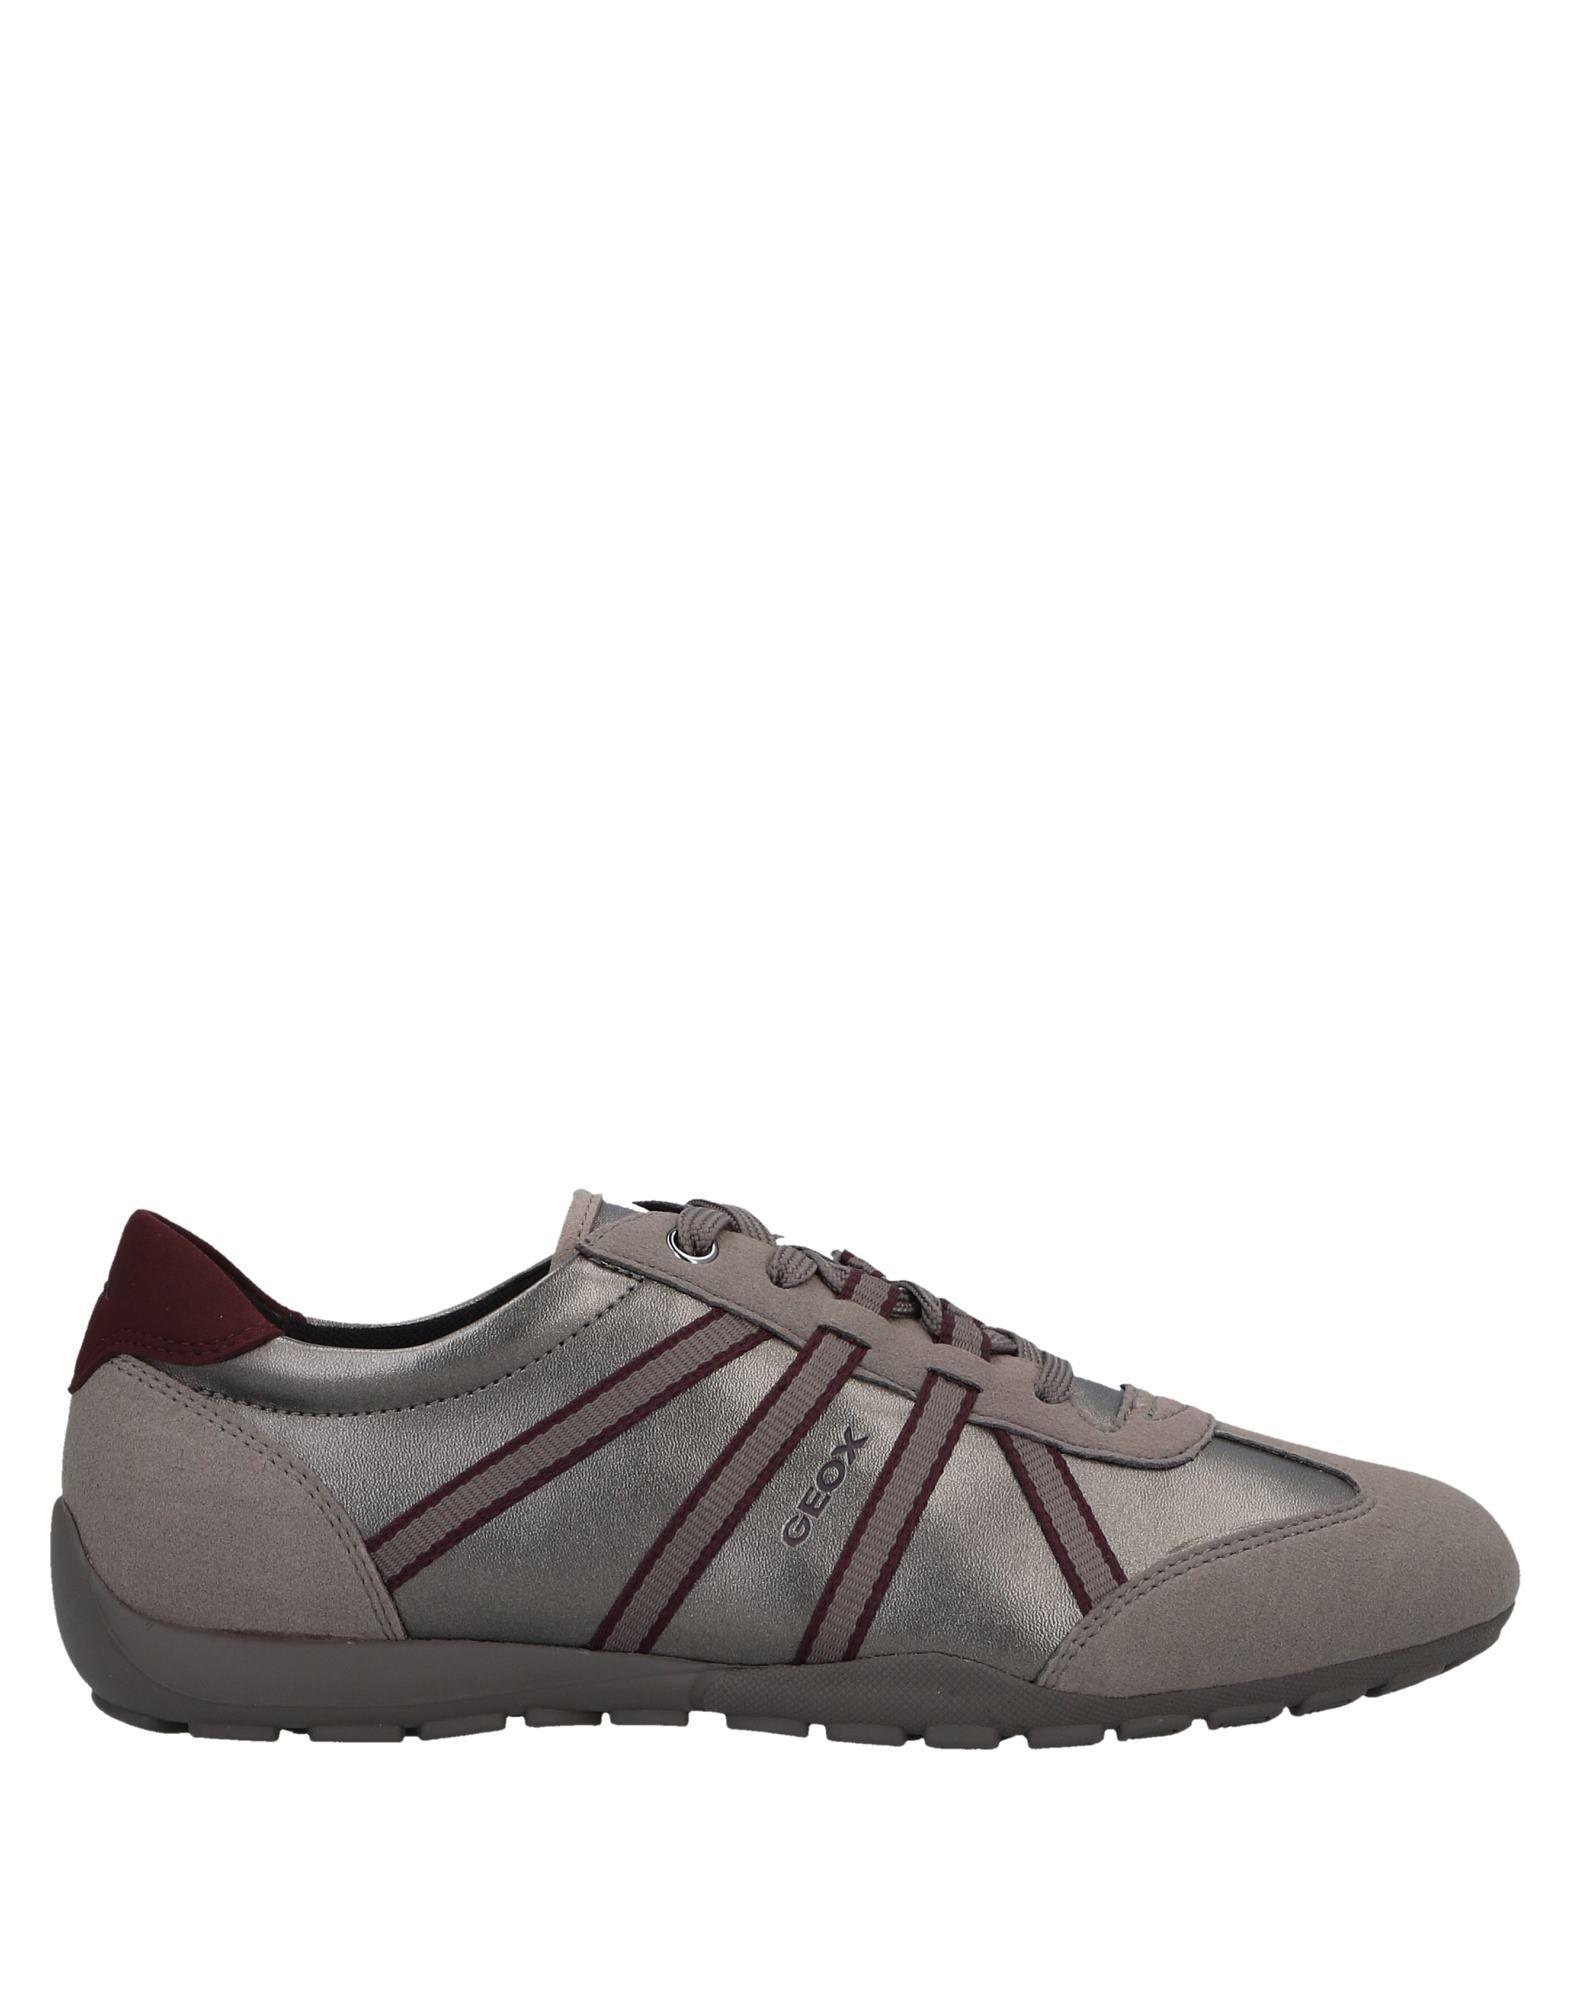 A buon mercato Sneakers Geox Donna - 11539514FN